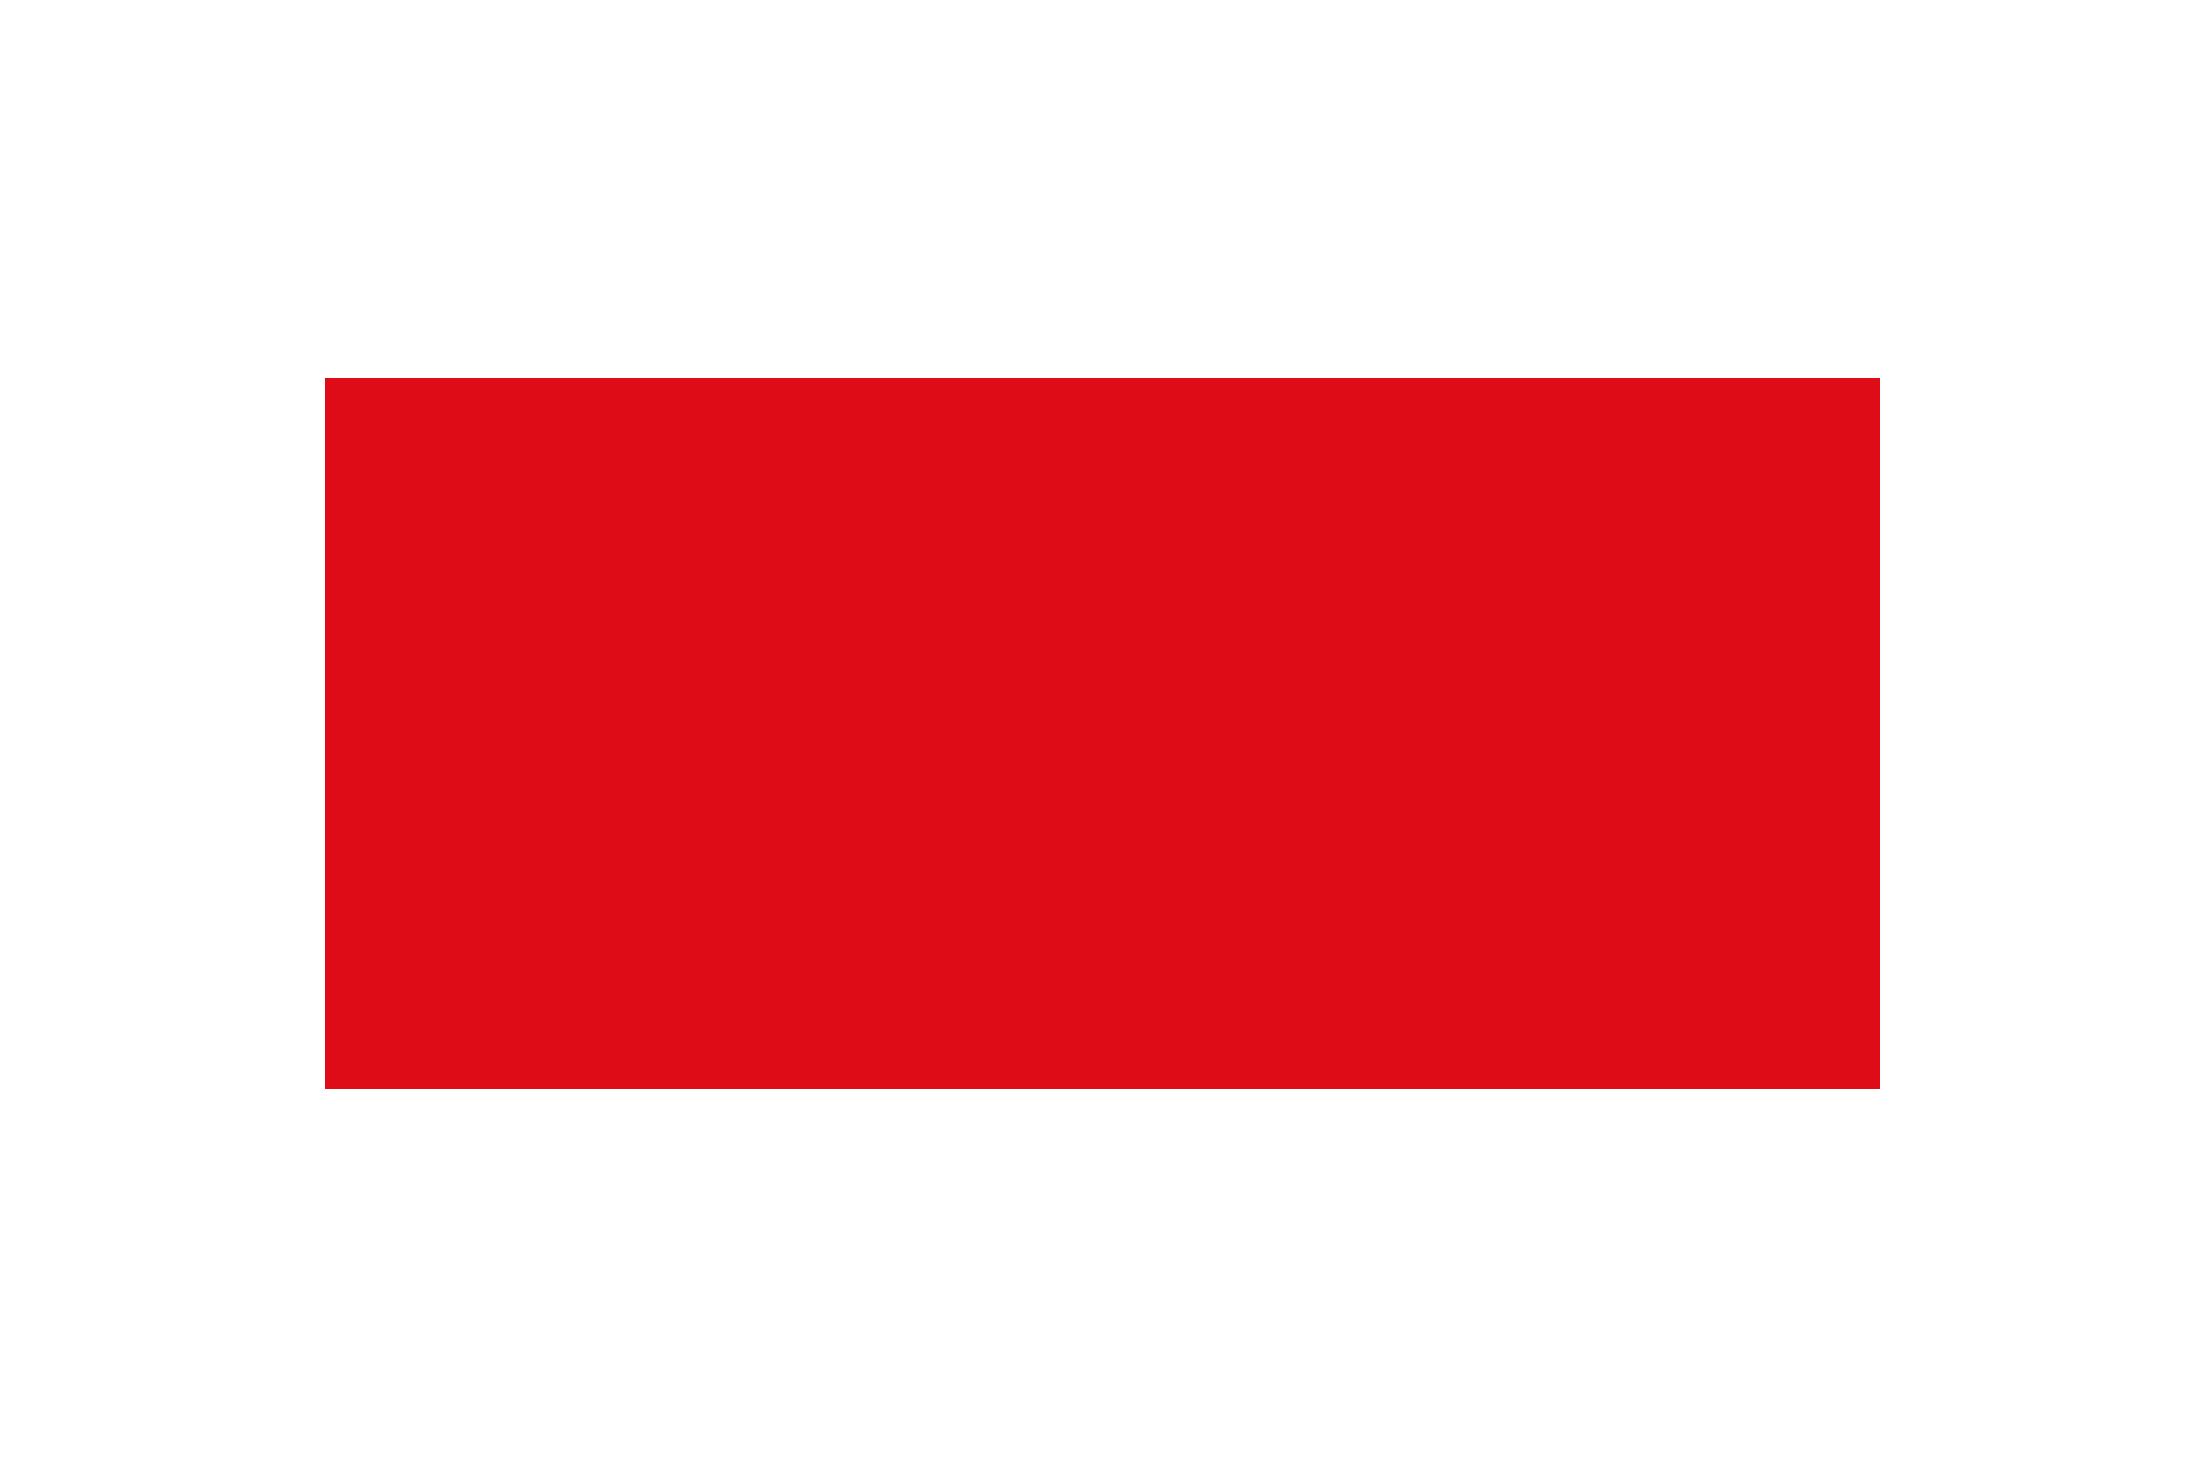 2020 stamp PSD